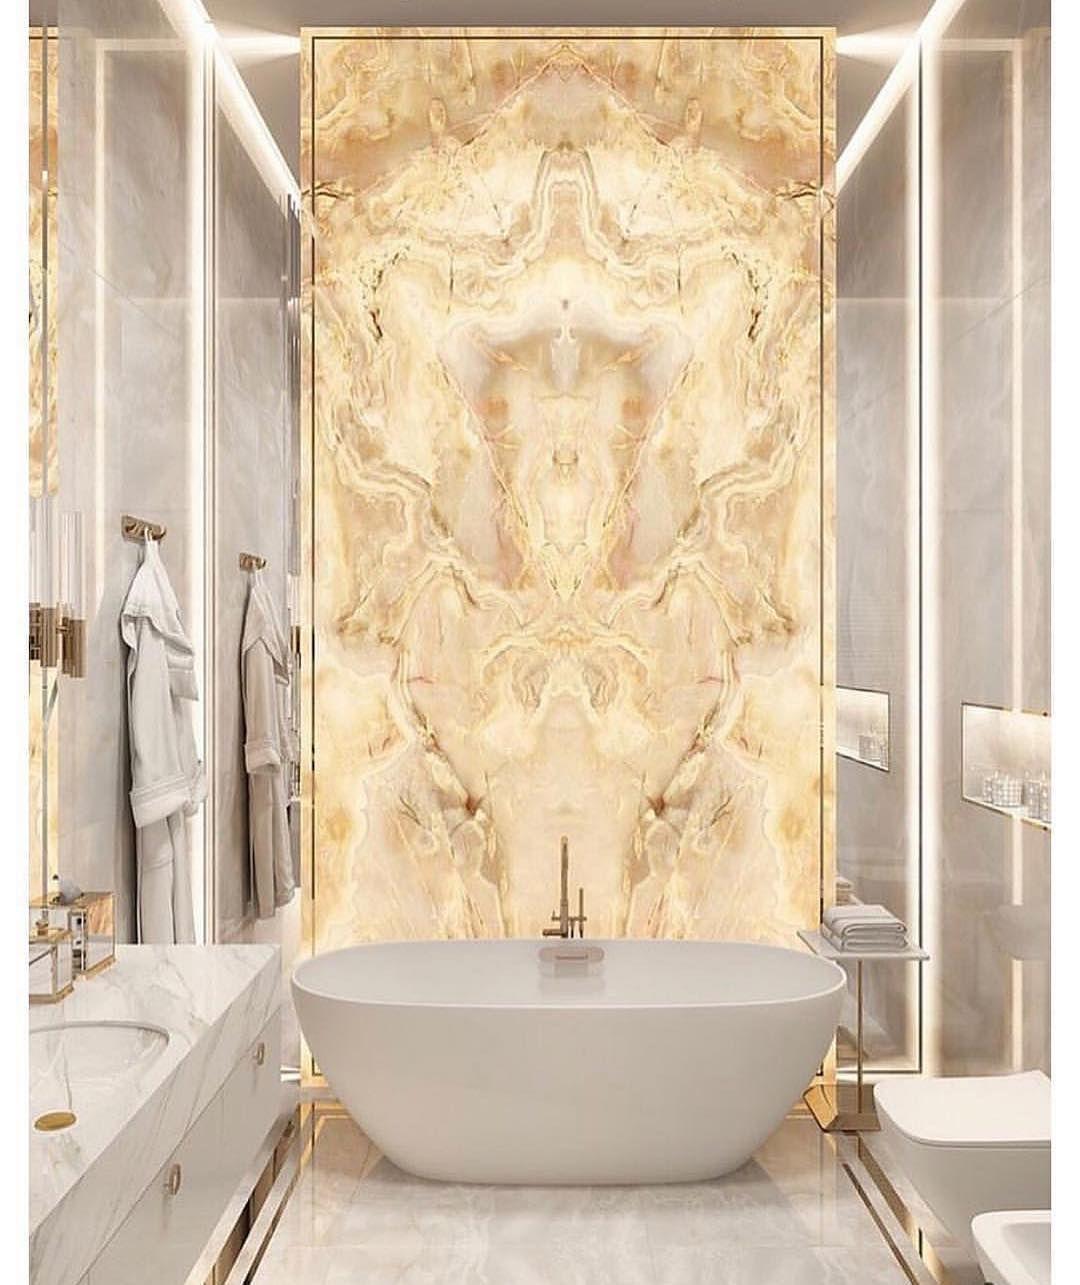 How To Make Your Home More Functional Bathroom Design Luxury Bathroom Interior Design Bathroom Design